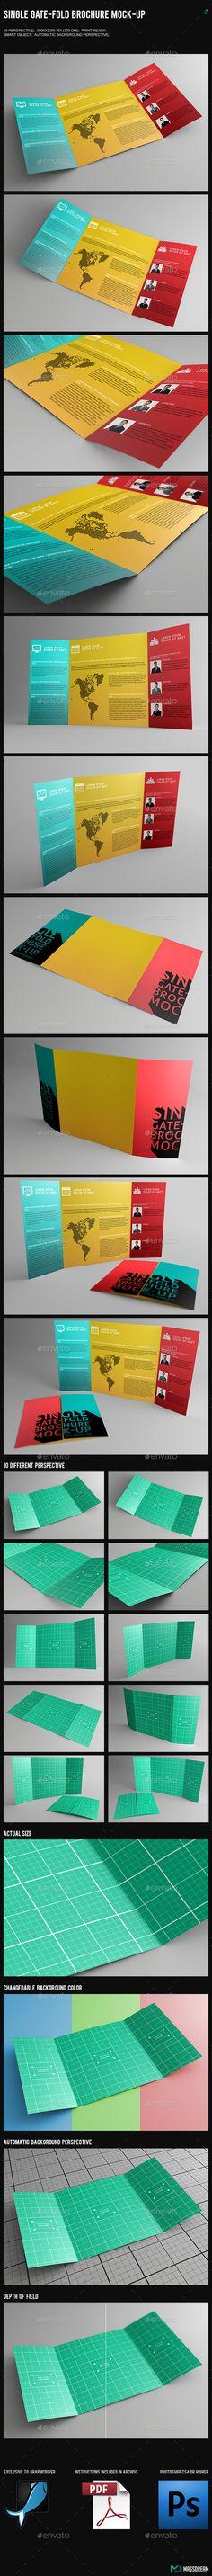 GraphicRiver Double Gate-Fold Brochure